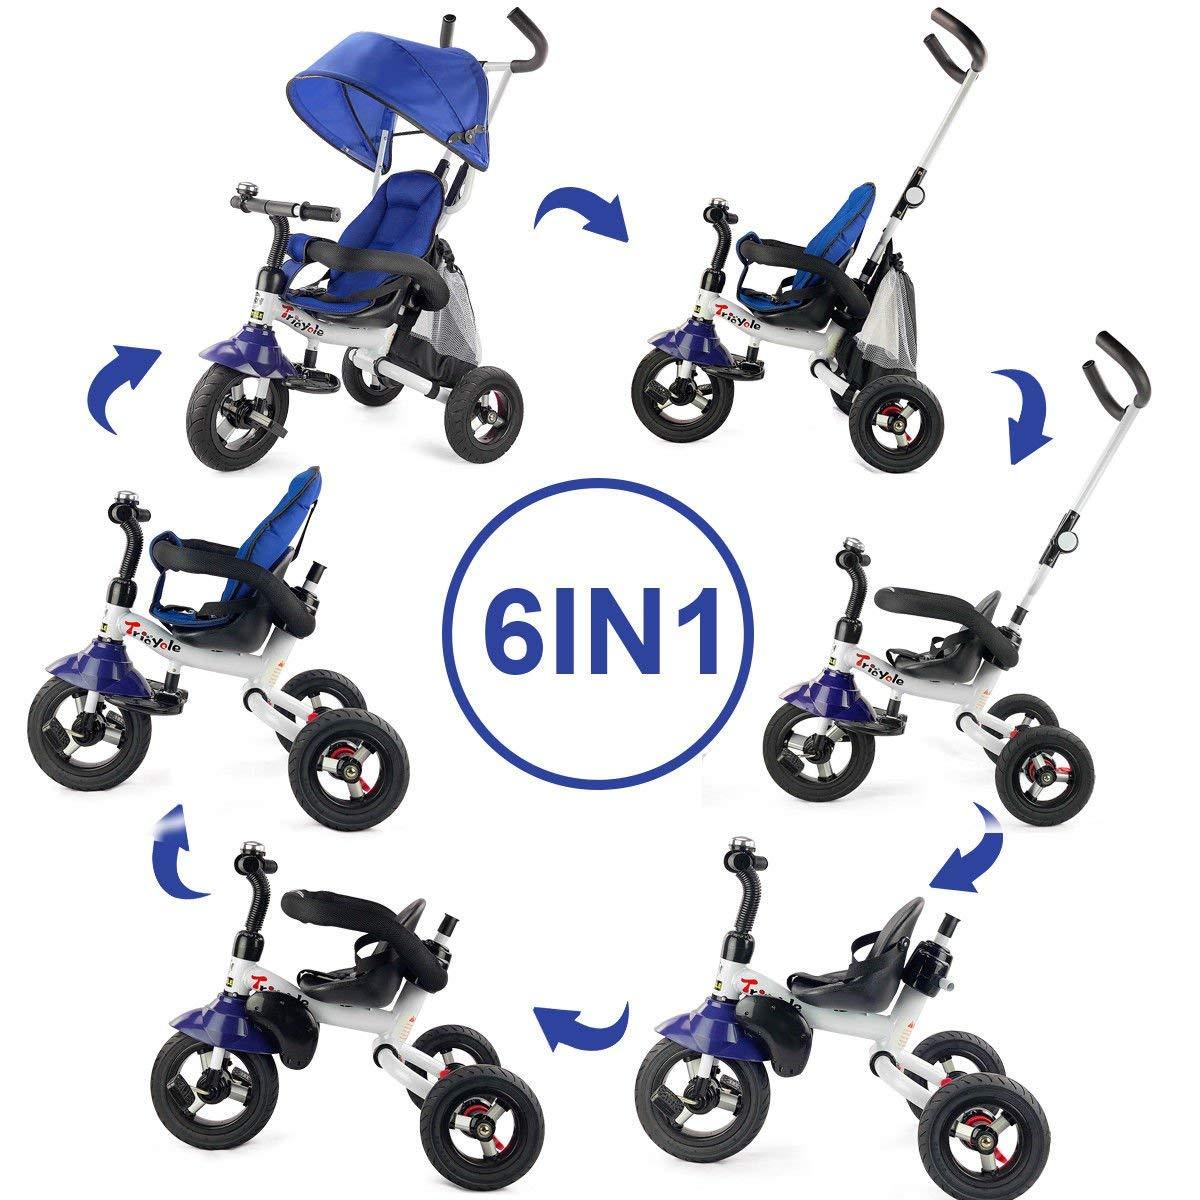 Azul Bicicleta de Aprendizaje para Ni/ños de 1 a/ño a 5 A/ños Cochecito Bebes UBROVOO 6 en 1 Triciclo Bebes Evolutivo Plegable Triciclos Trike